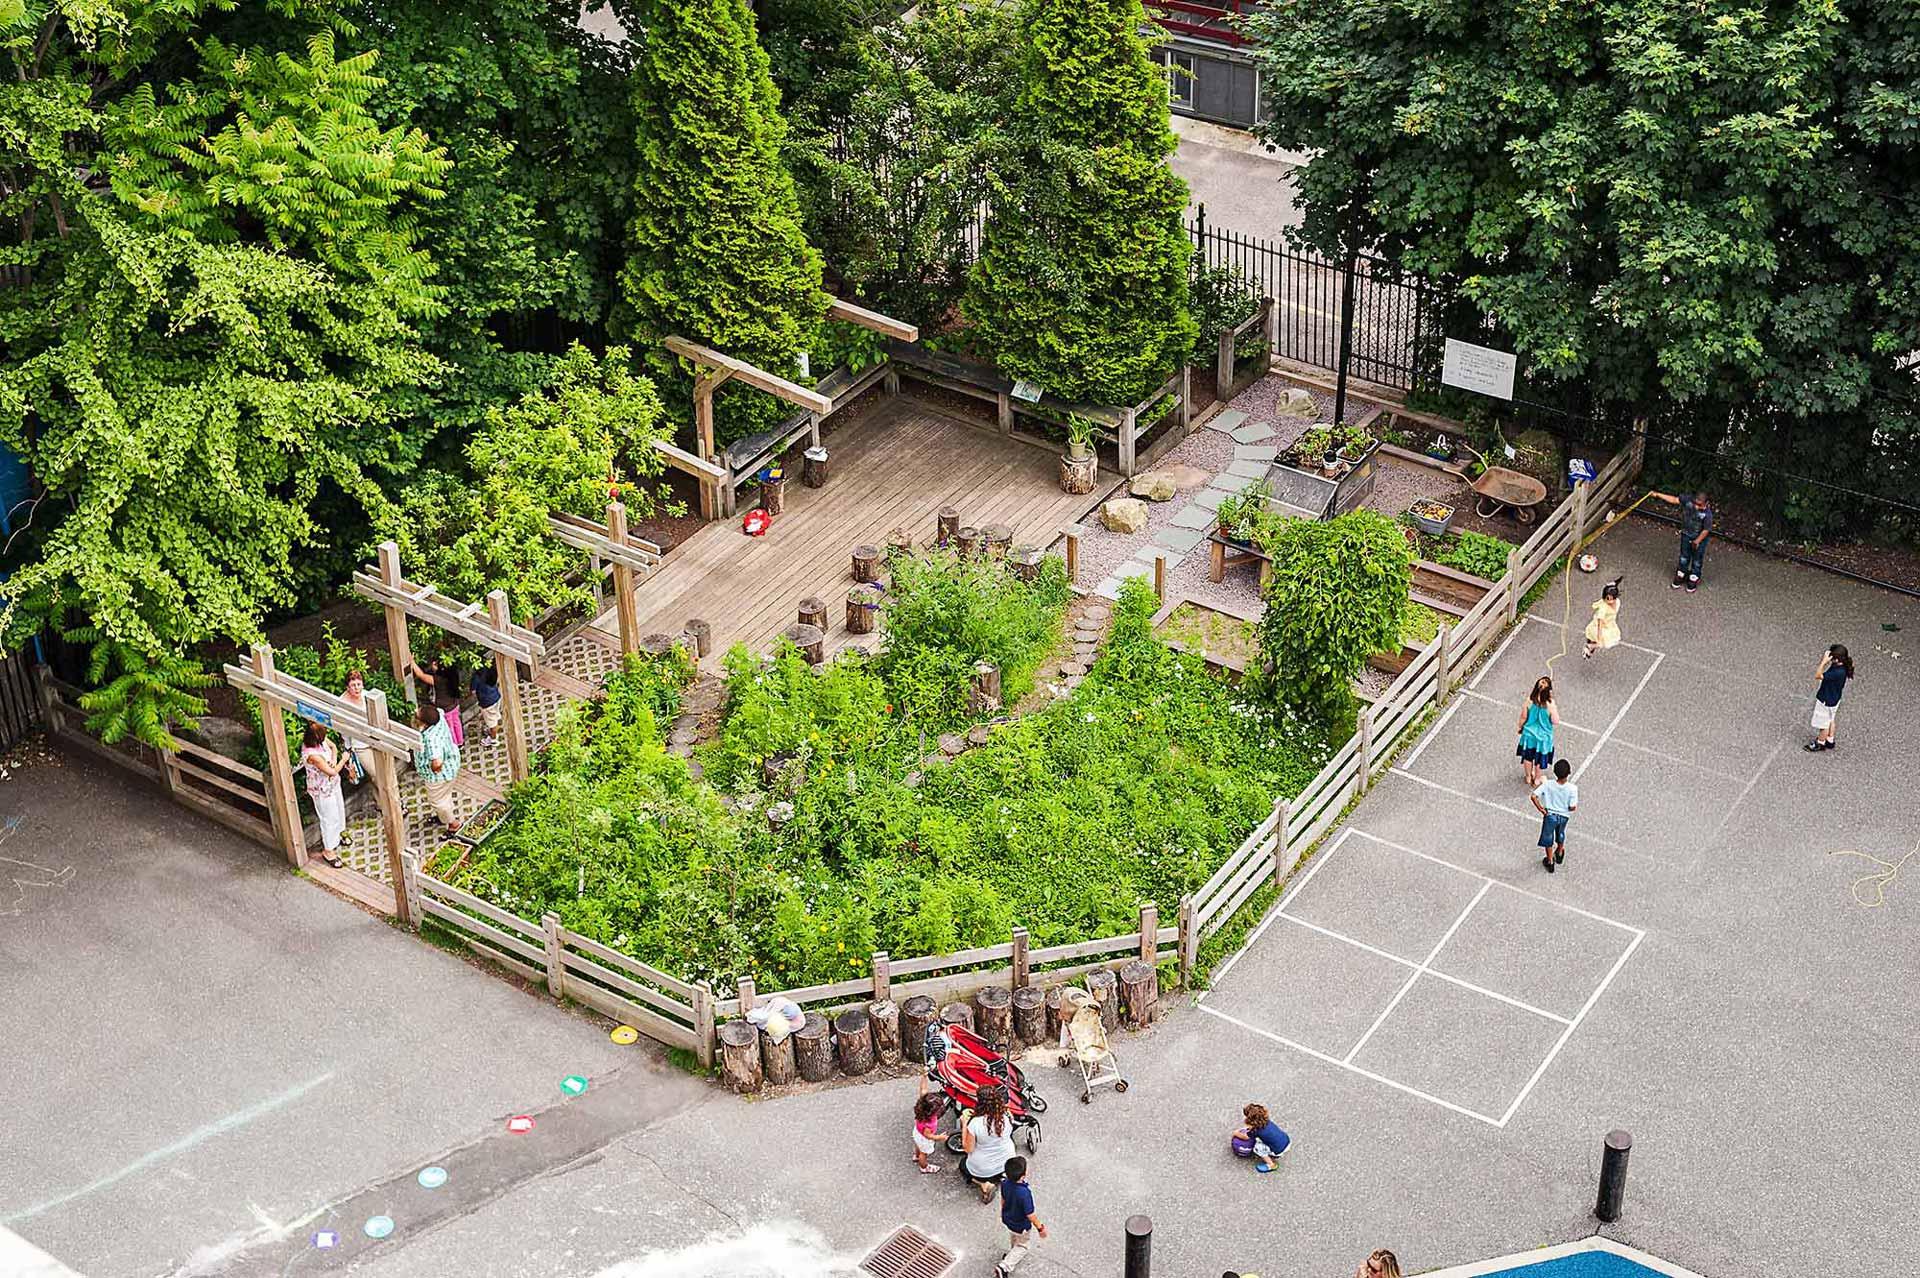 1_Schoolyard-Initiative_Klopfer-Martin-Design-Group_bird's-view_nature-play_outdoor-classroom.jpg